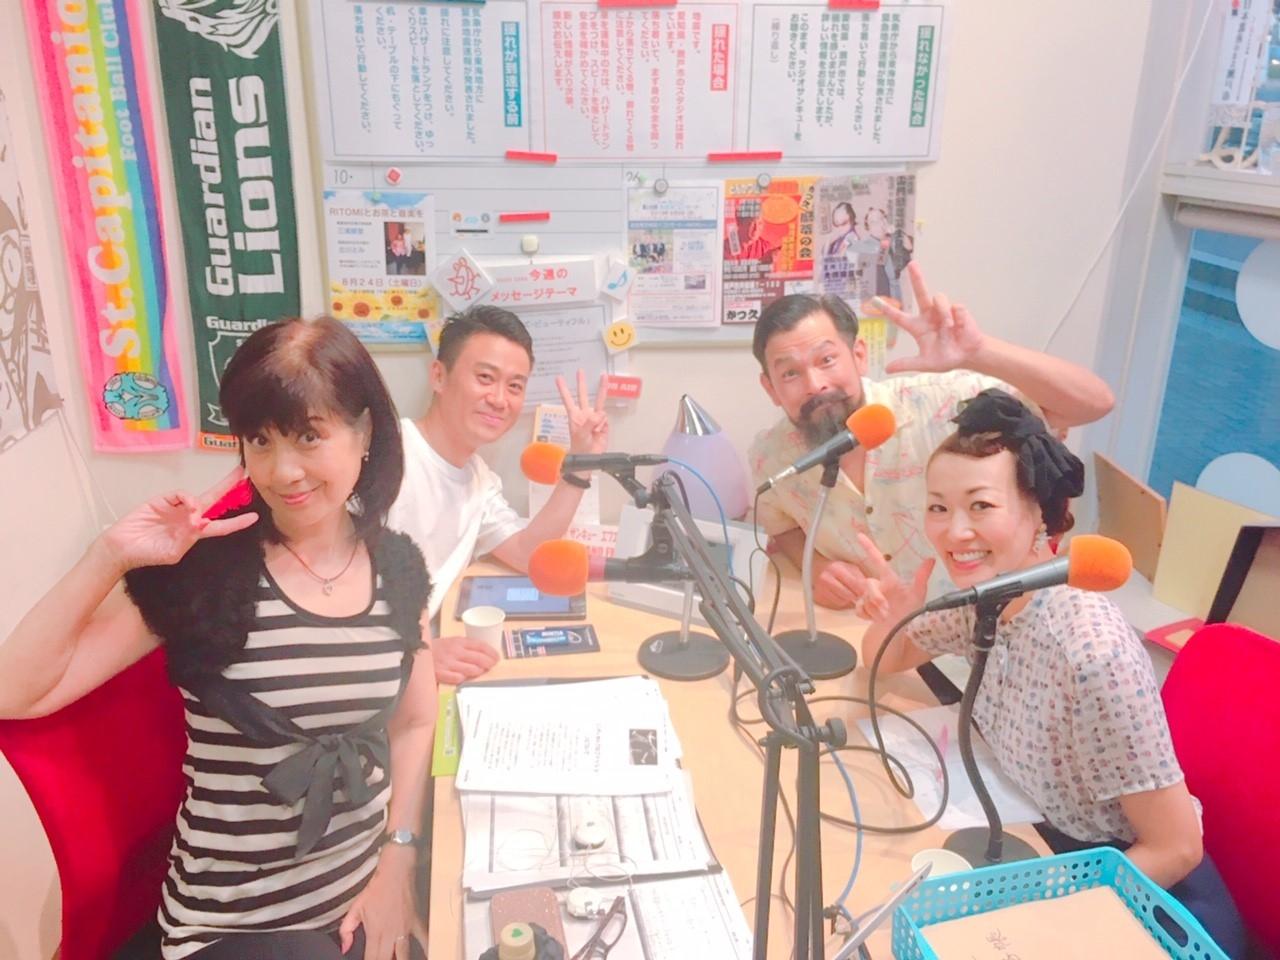 Tommy's Club AKOSWINGさん Toruさん DJ Yo-Heyさん